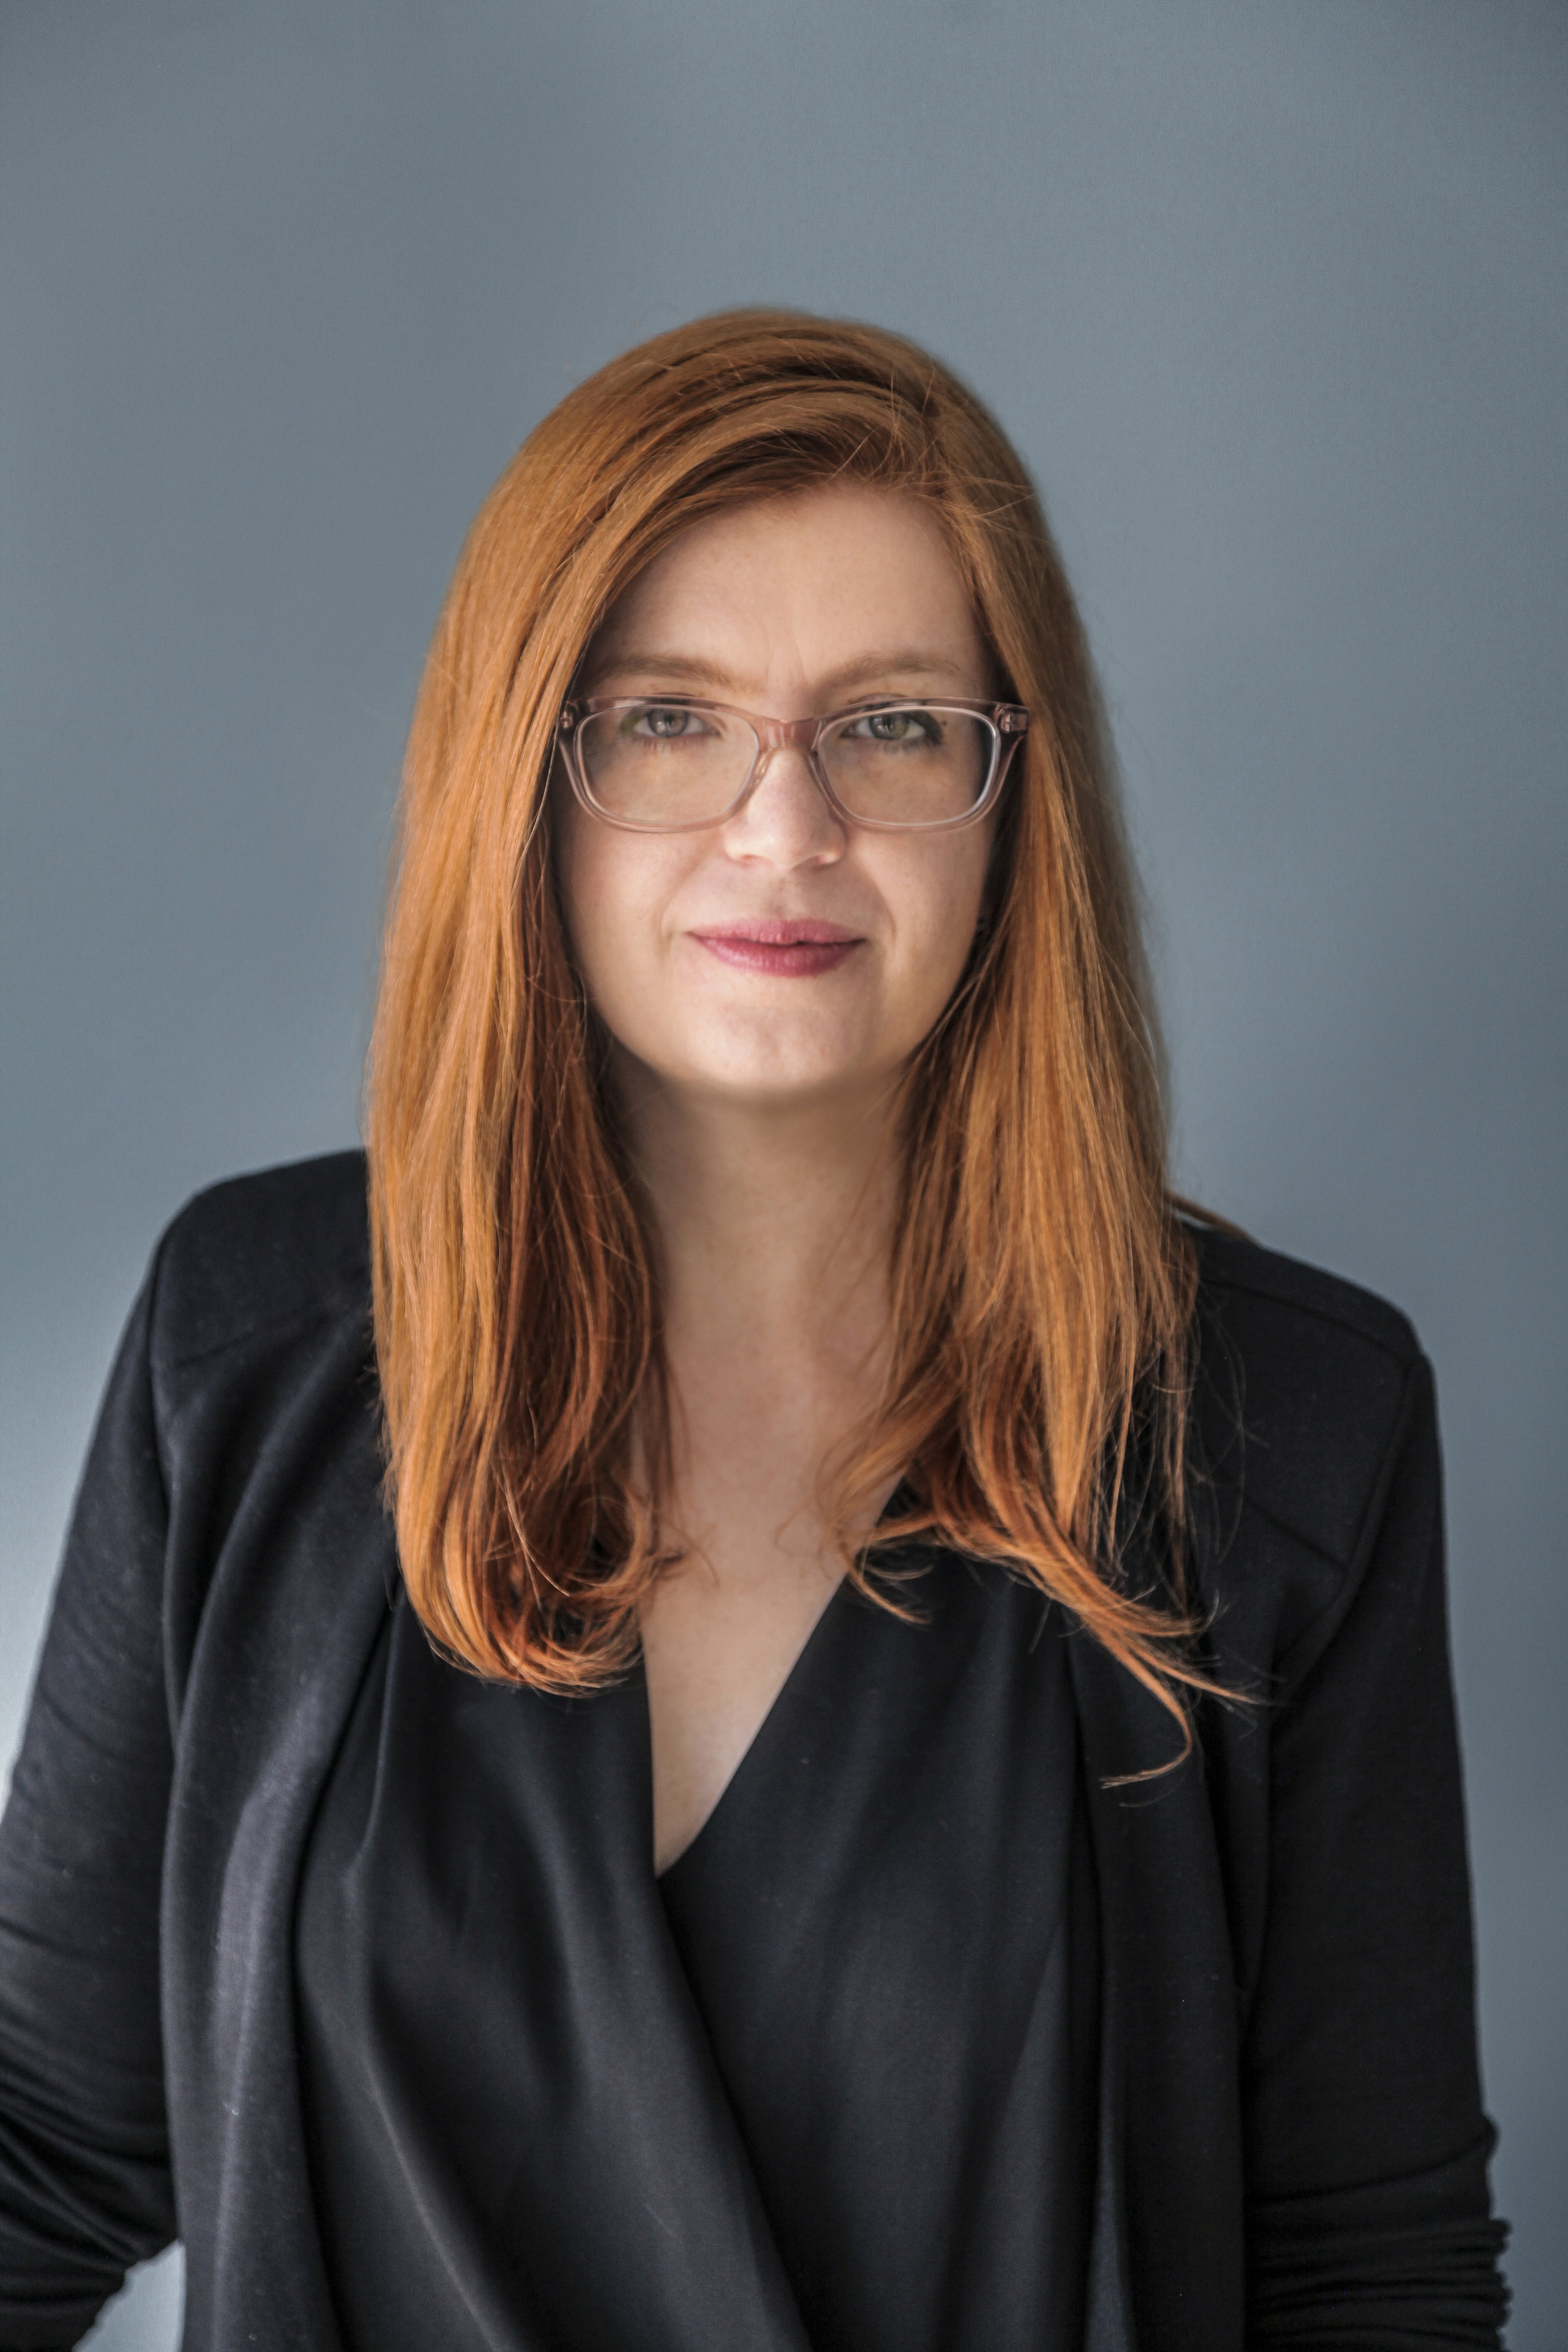 Sarah Loertscher